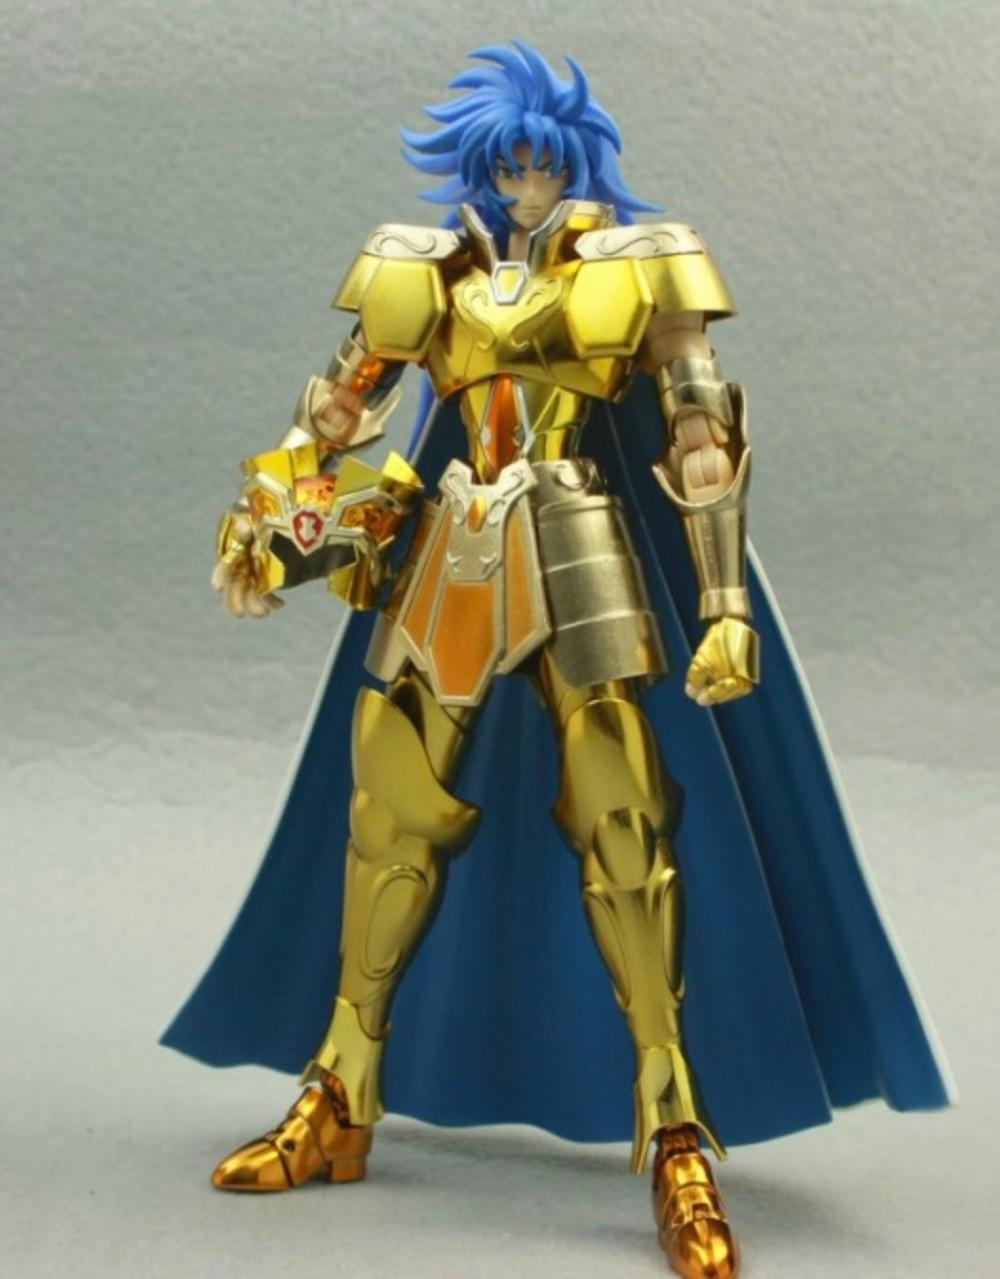 S-Temple model ST Gemini Saga Kanon Saint Seiya metal armor Myth Cloth Gold Ex Action Figure cmt in storelc model gemini saga kanon saint seiya myth cloth gold ex gemini saga kanon action figure